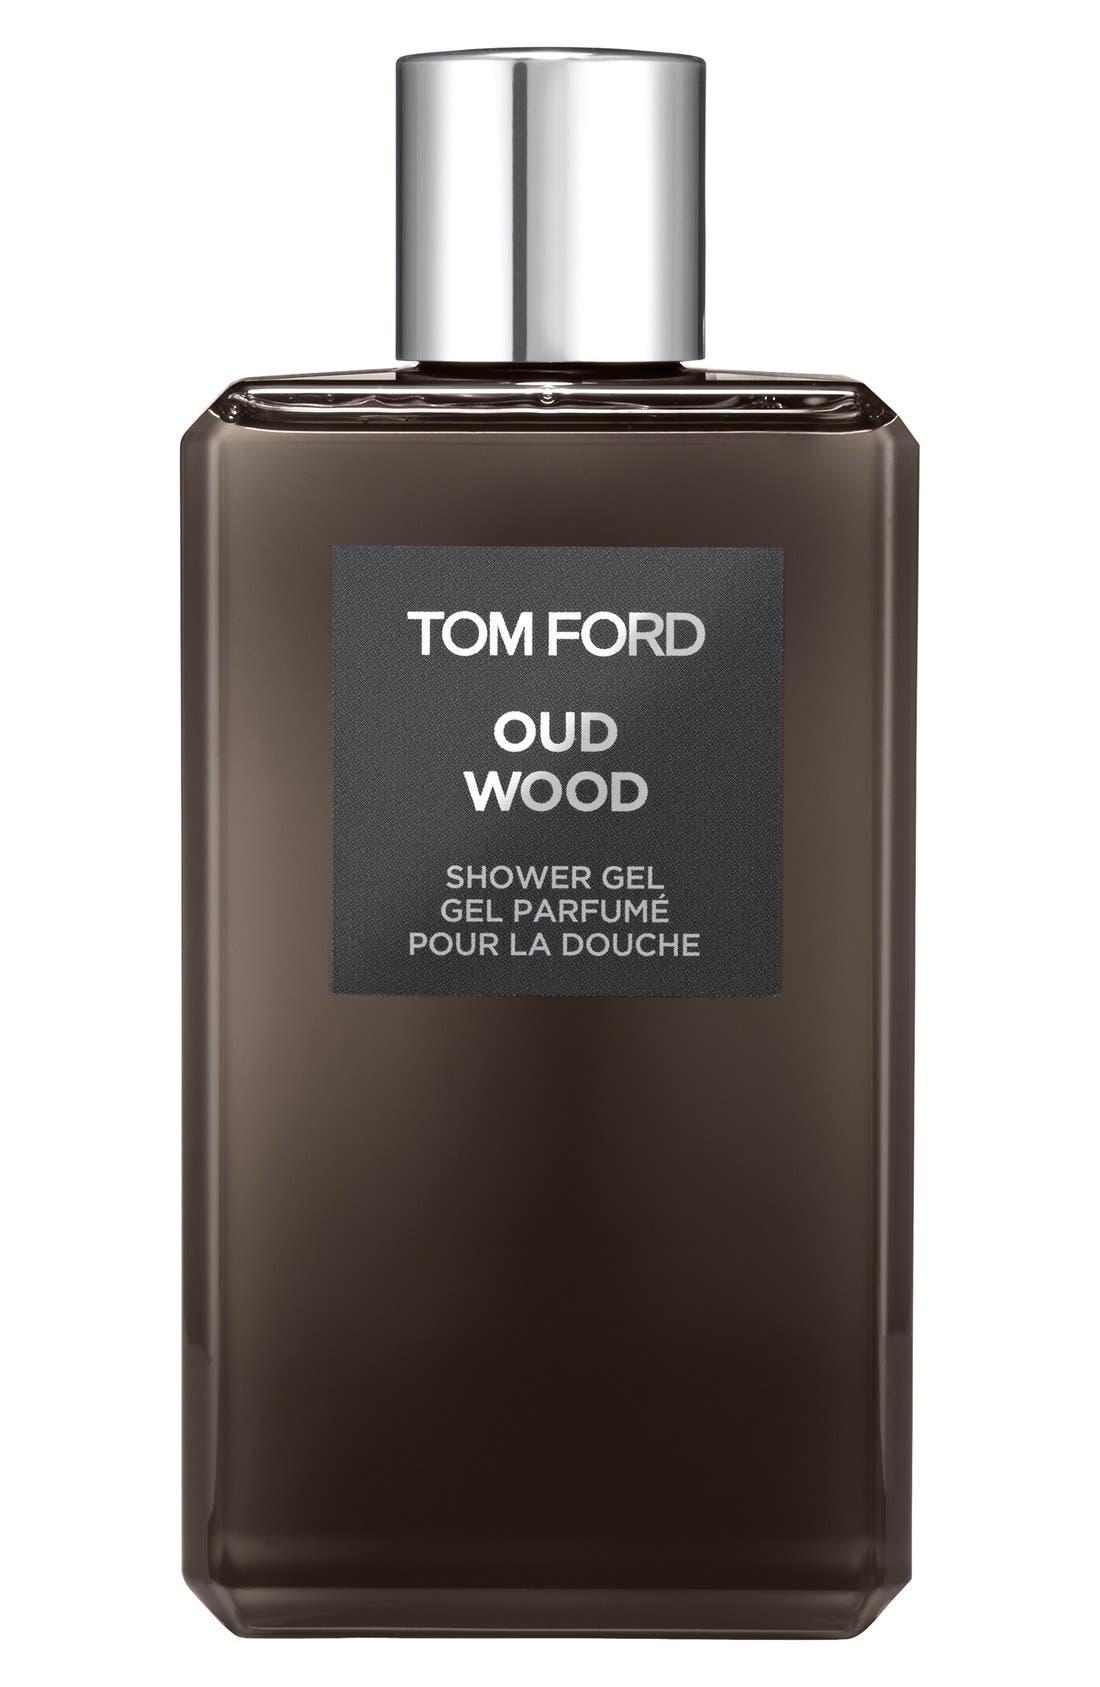 Tom Ford 'Oud Wood' Shower Gel